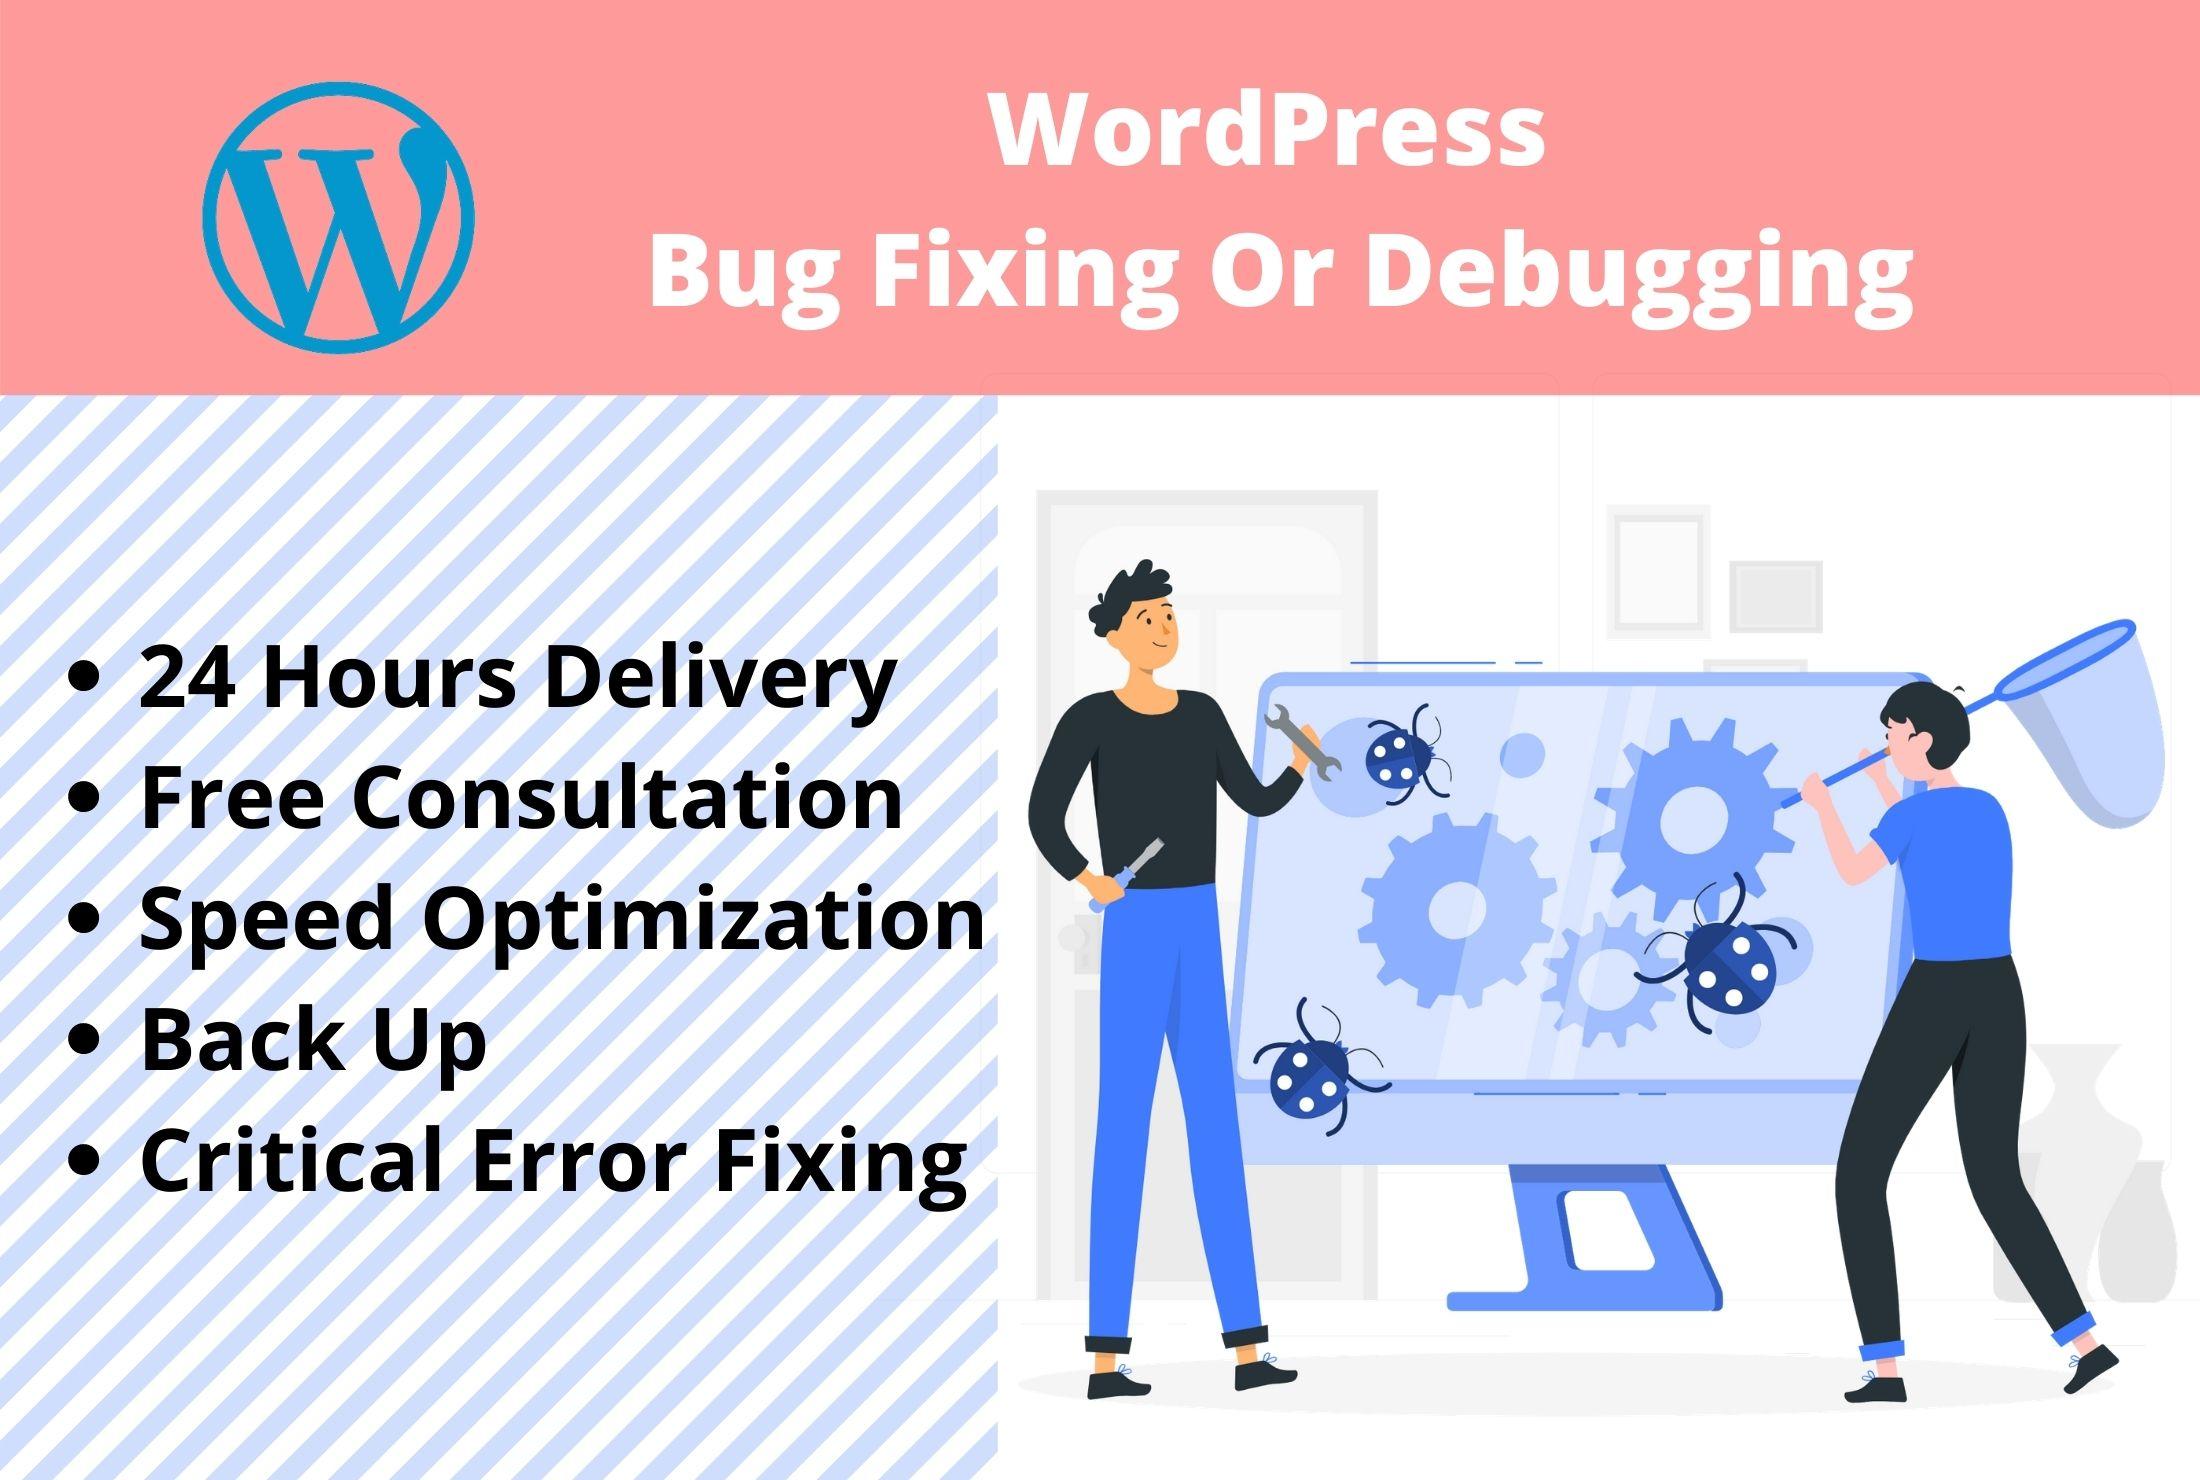 I will fix or debug 1 WordPress website issue,  critical error quickly